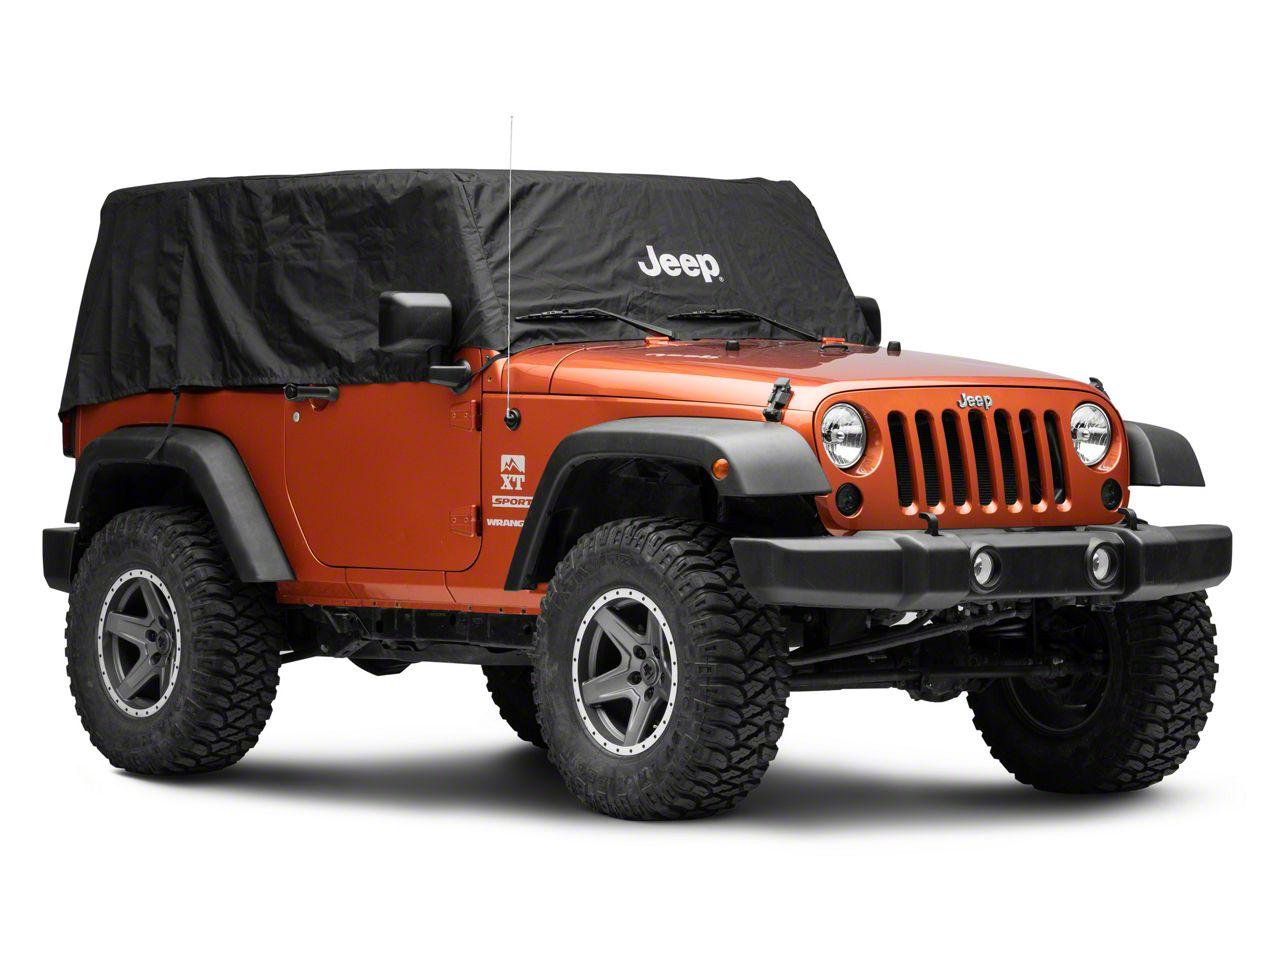 Mopar Cab Cover w/ Jeep Logo - Silver (07-18 Jeep Wrangler JK 2 Door)